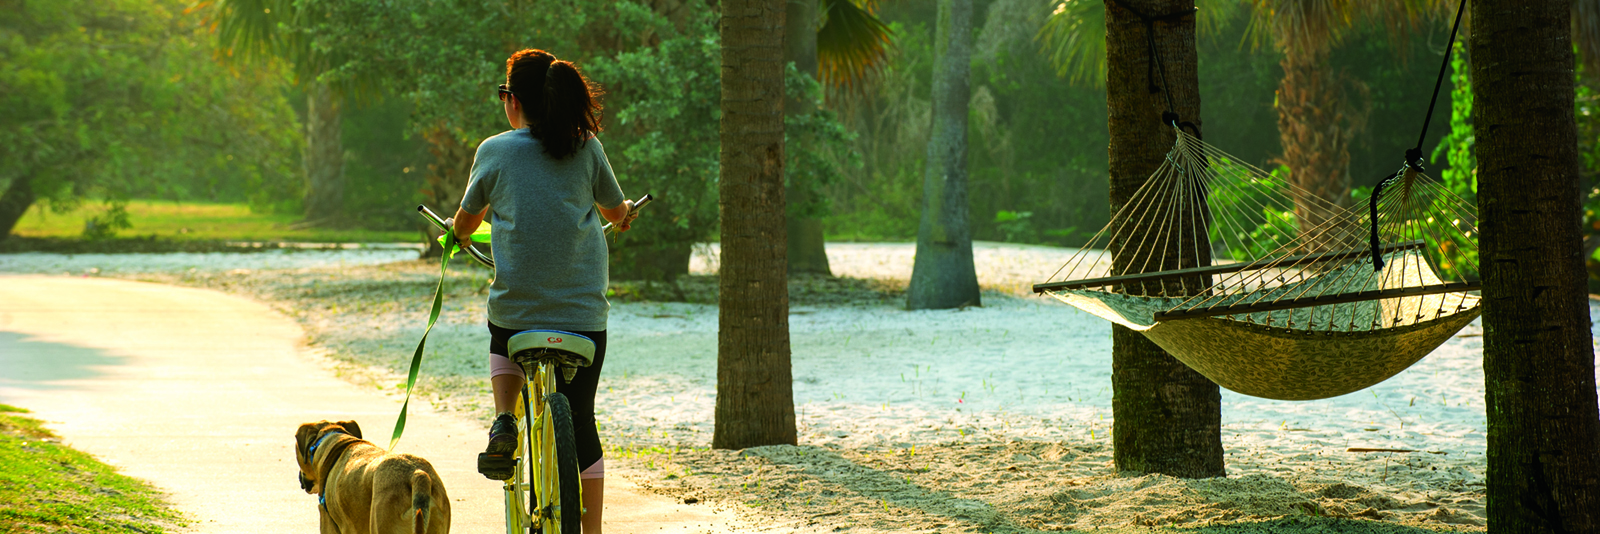 Student biking with dog along South Beach